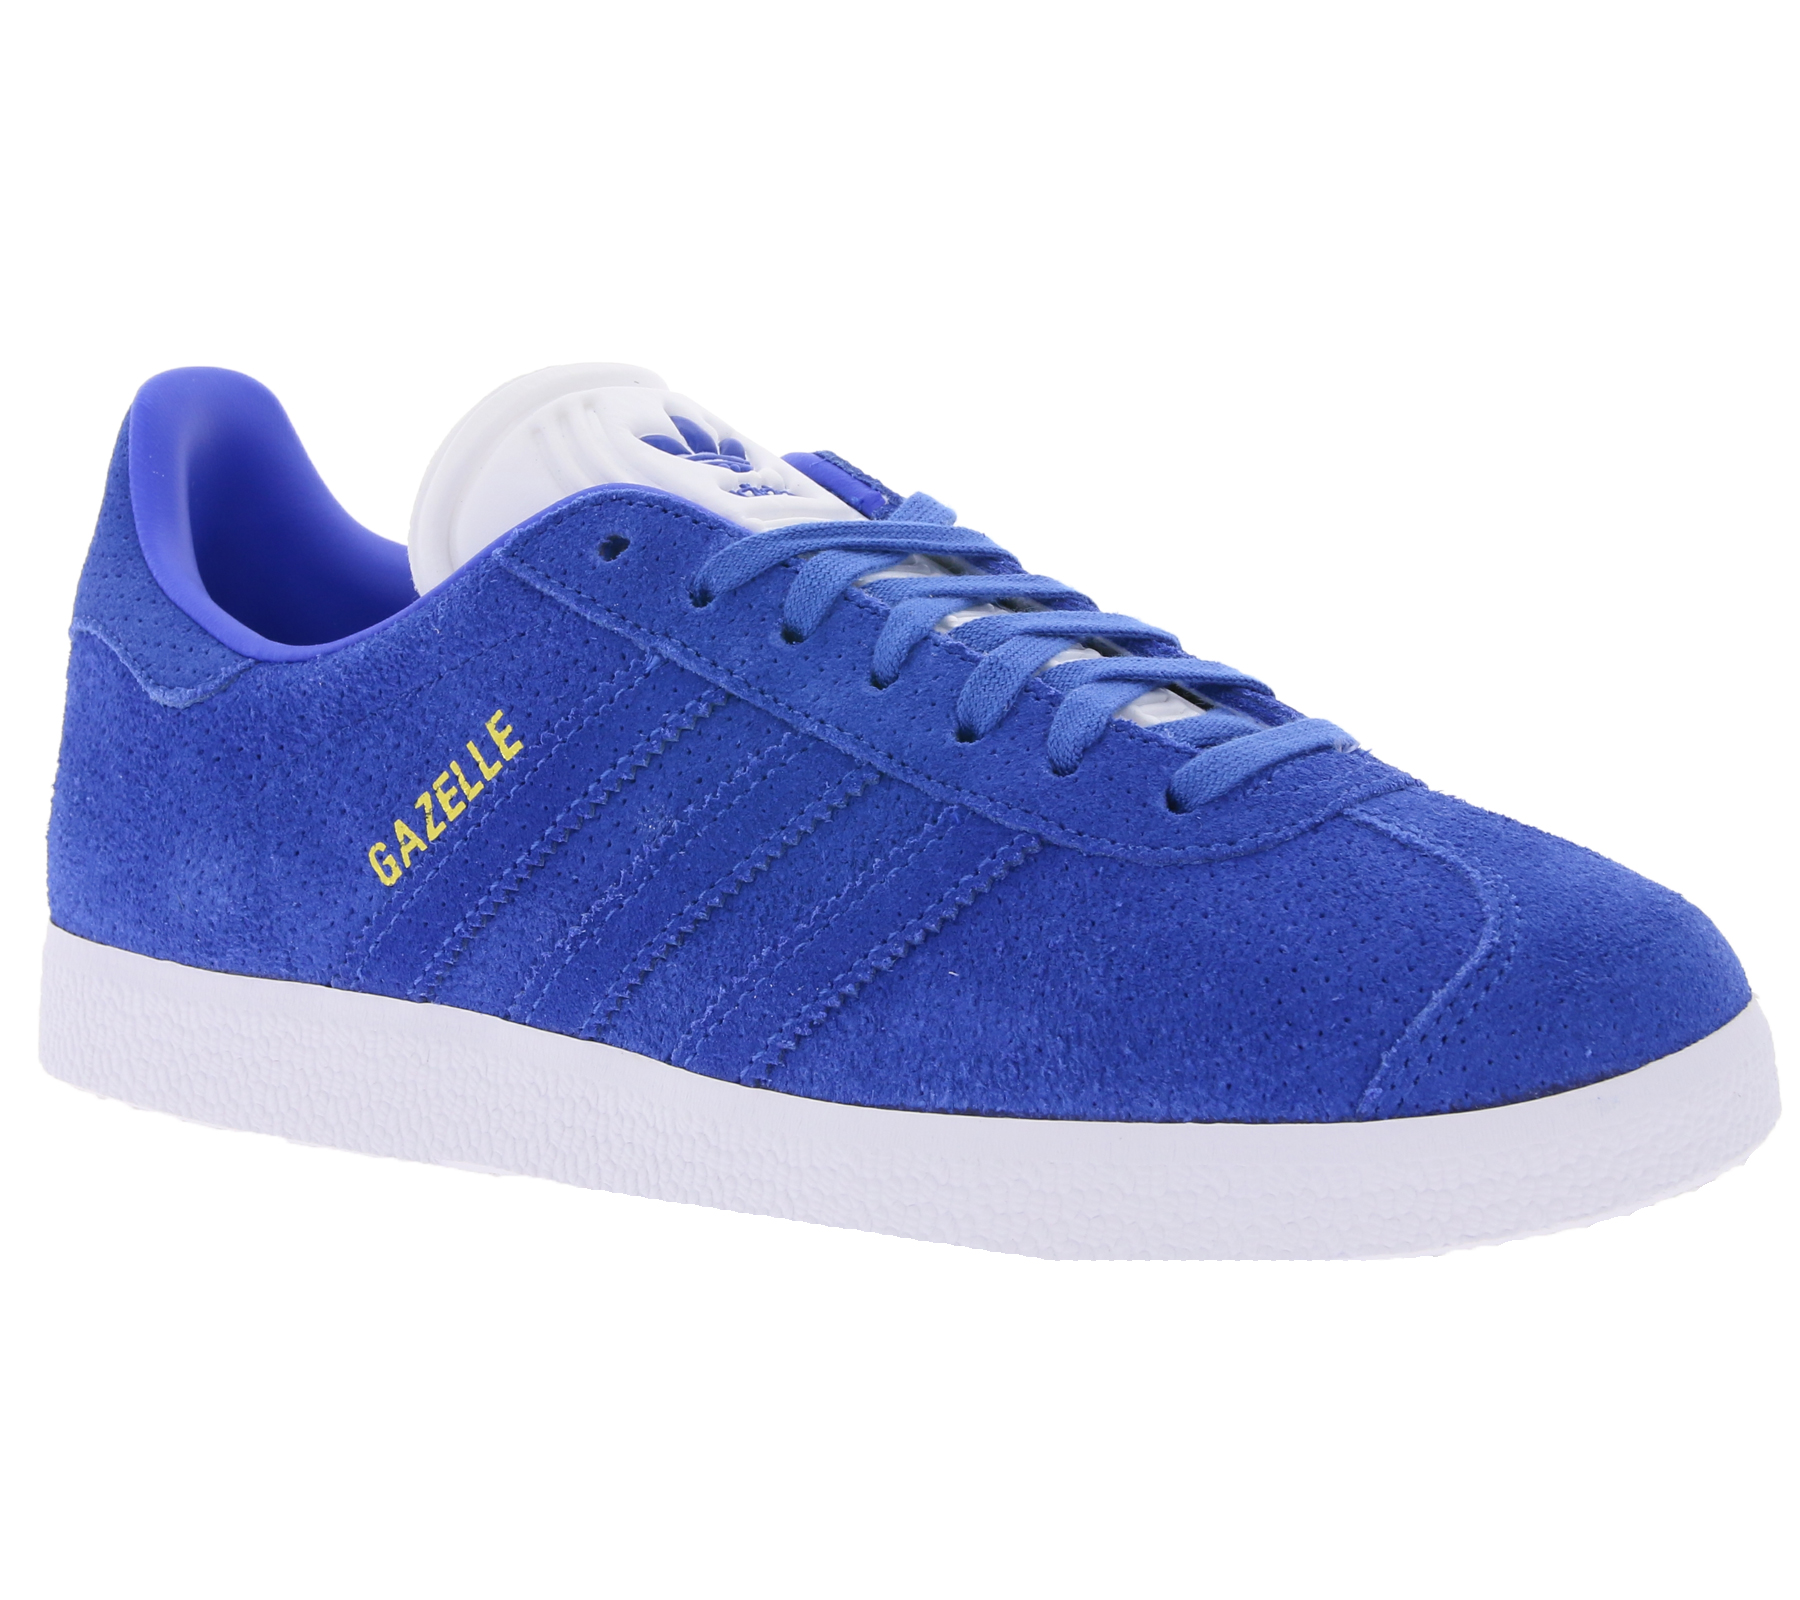 adidas turnschuhe blau damen